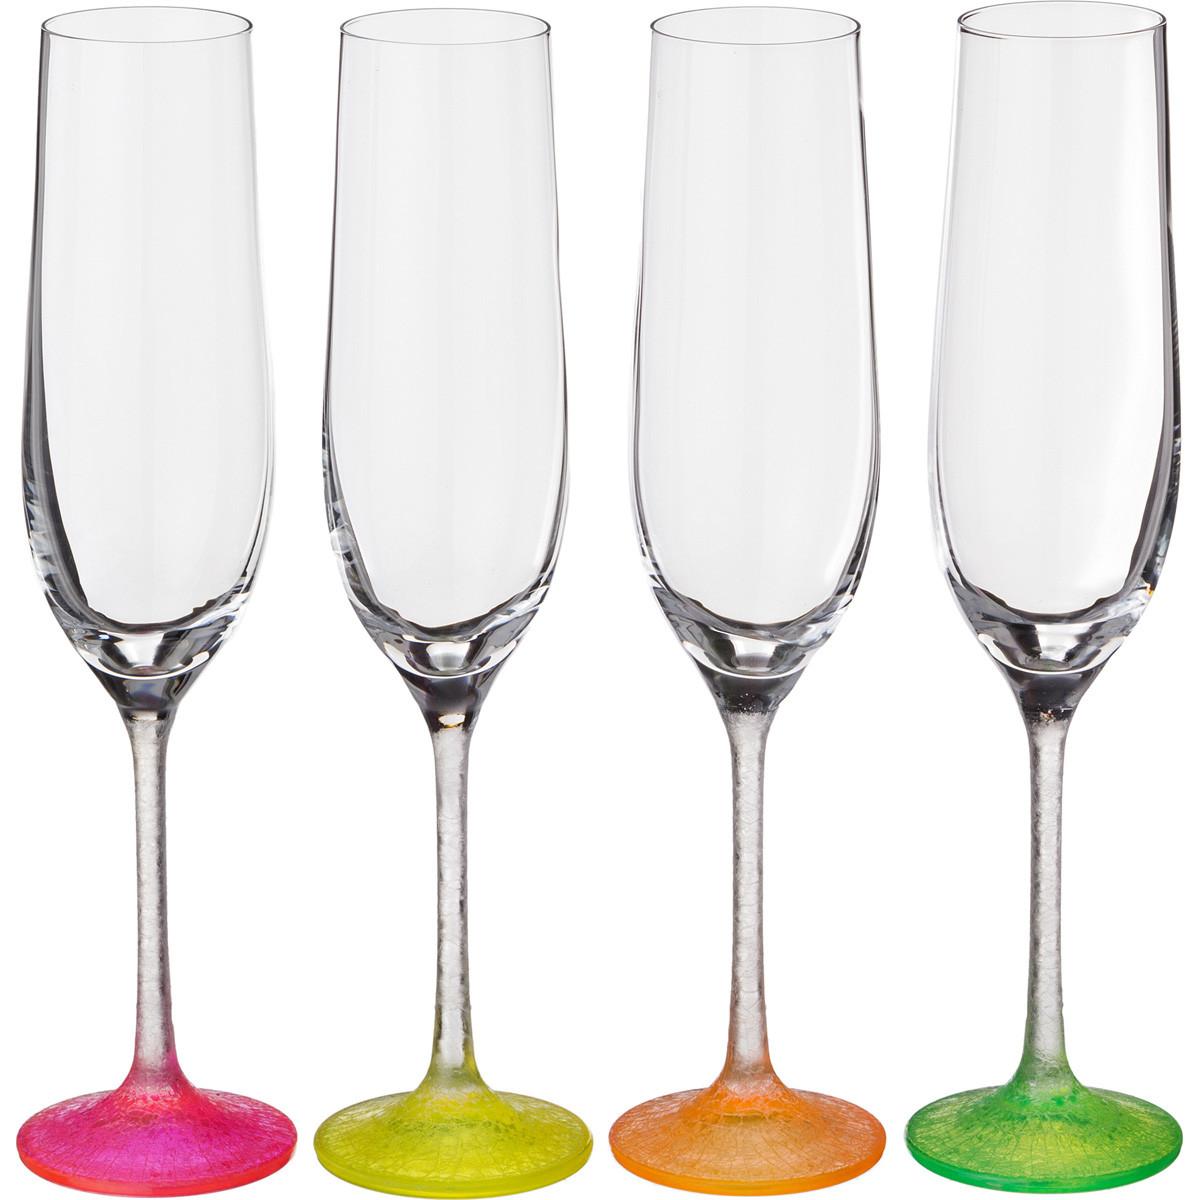 {} Bohemia Crystal Набор бокалов для шампанского Bambie  (24 см - 4 шт) набор для кофе crystal bohemia mokko 4 предмета